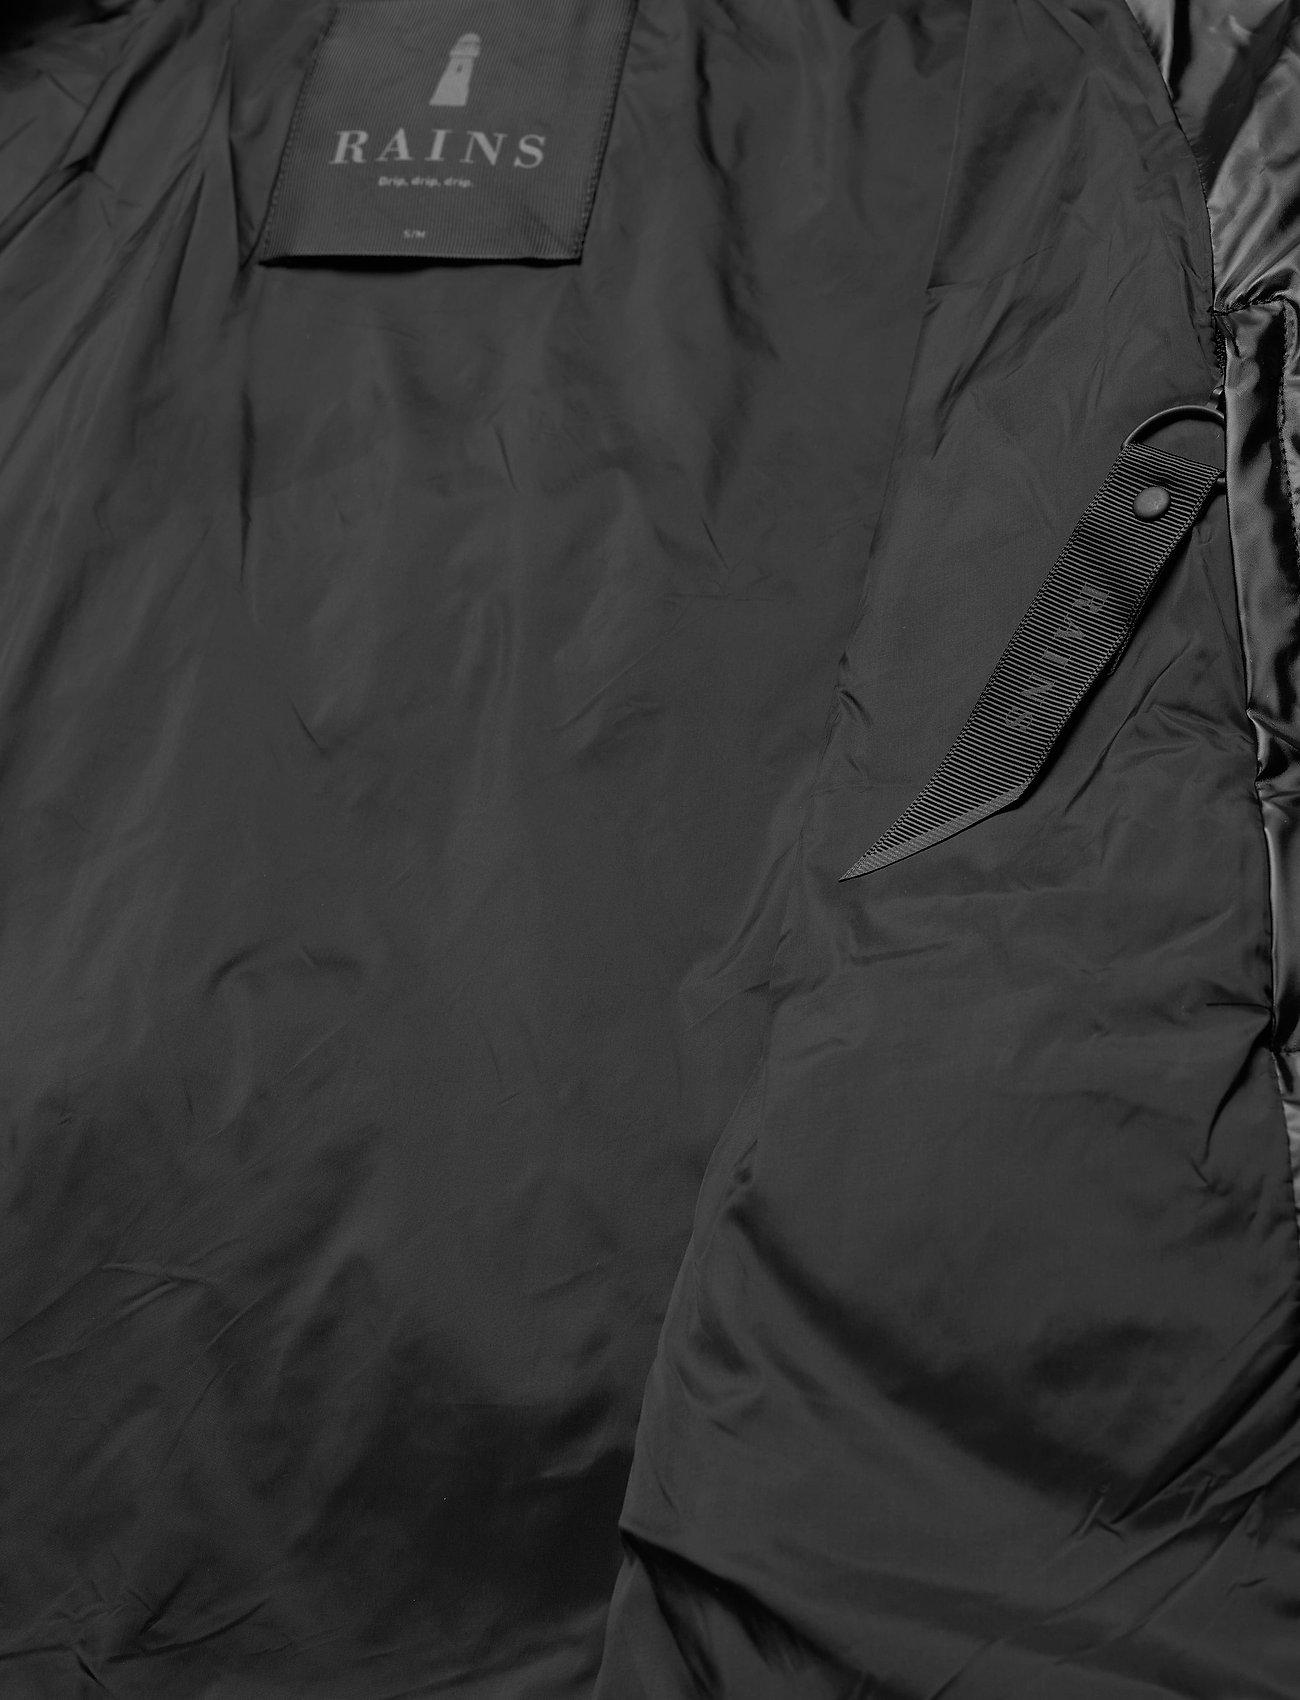 Rains Boxy Puffer Jacket - Jakker & Kåper 76 SHINY BLACK - Menn Klær